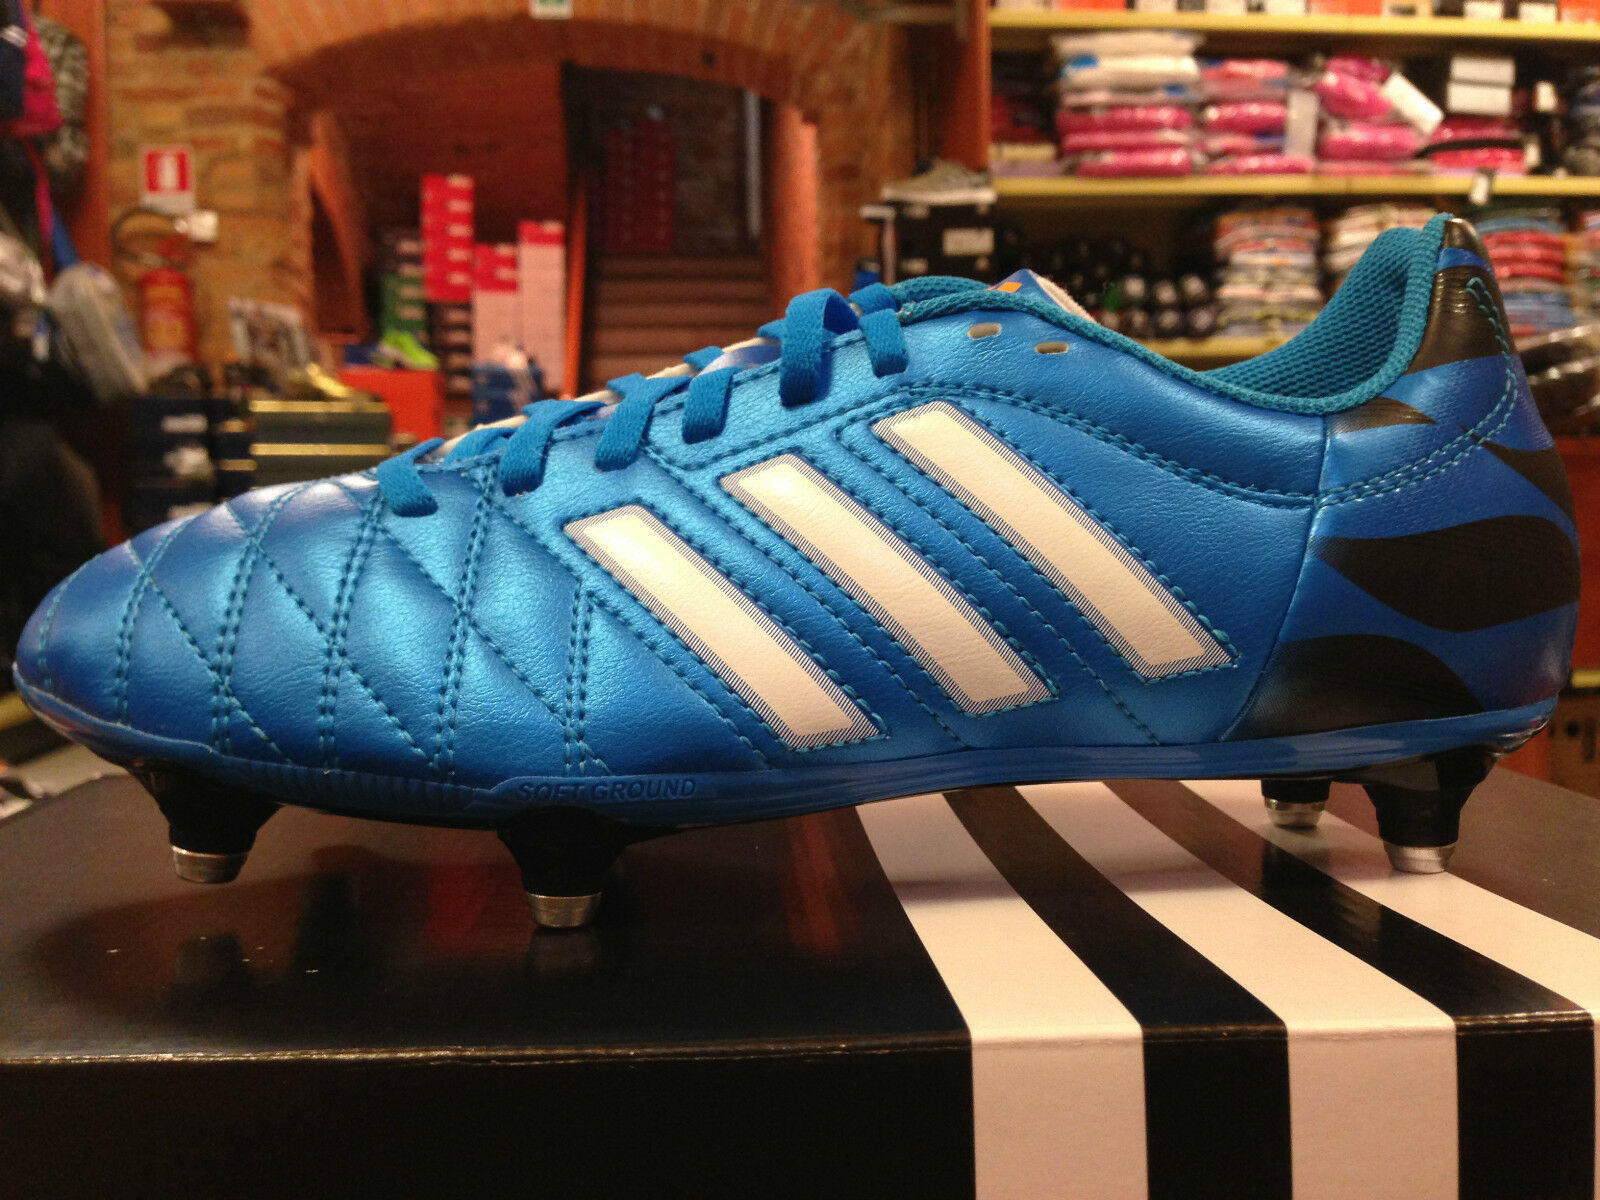 Herren Schuhe Fußball ADIDAS 11 QUESTRA SG art.M29854 6 TACC. Twist-up Leder SYN